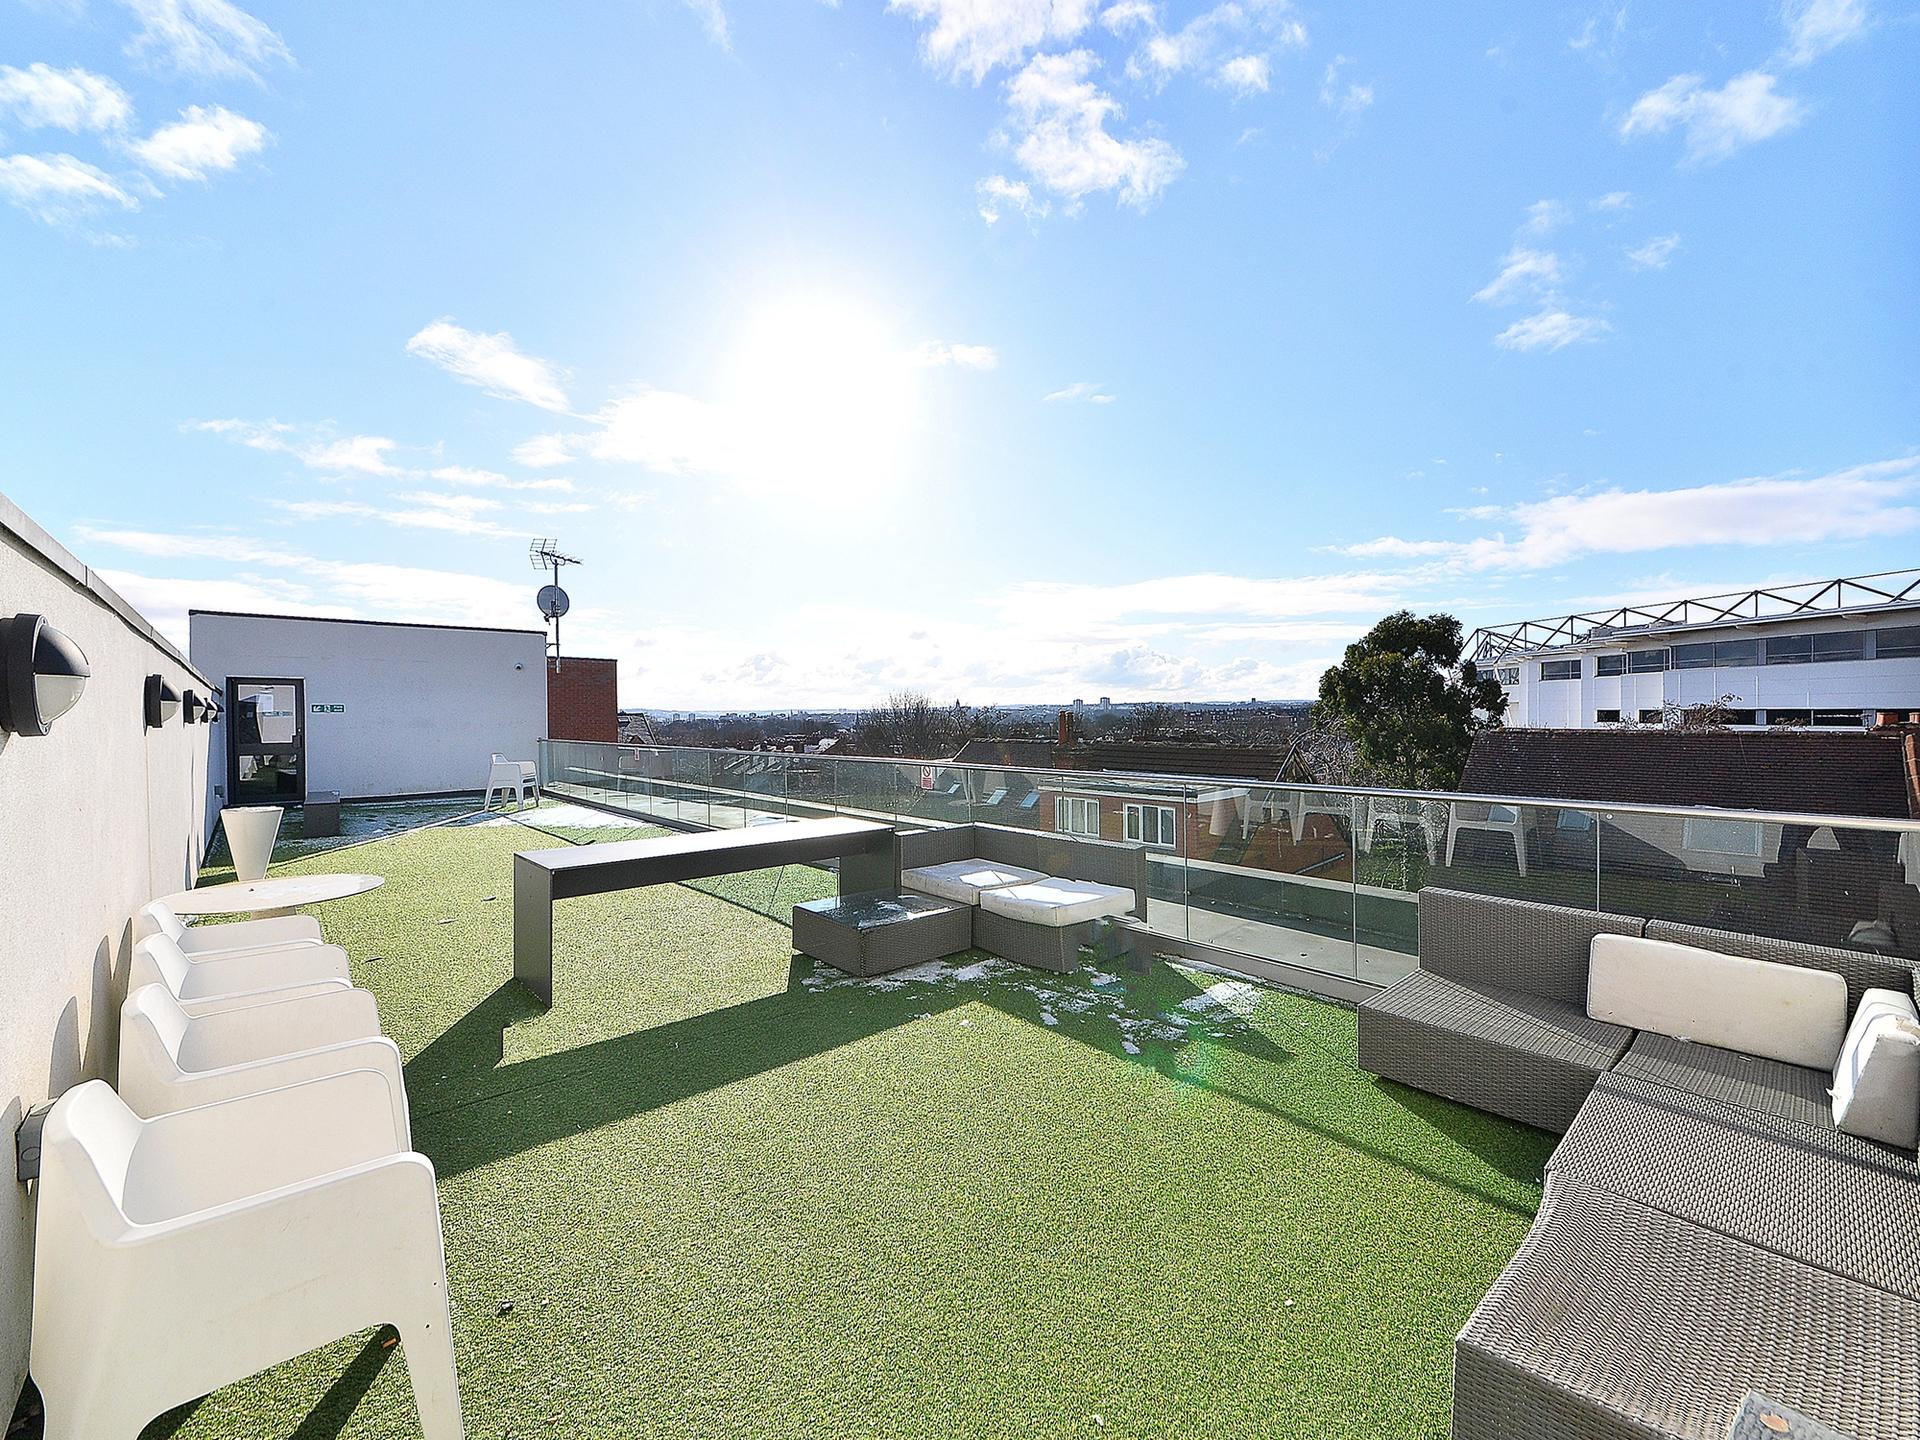 terrace student accommodation The Pavilion